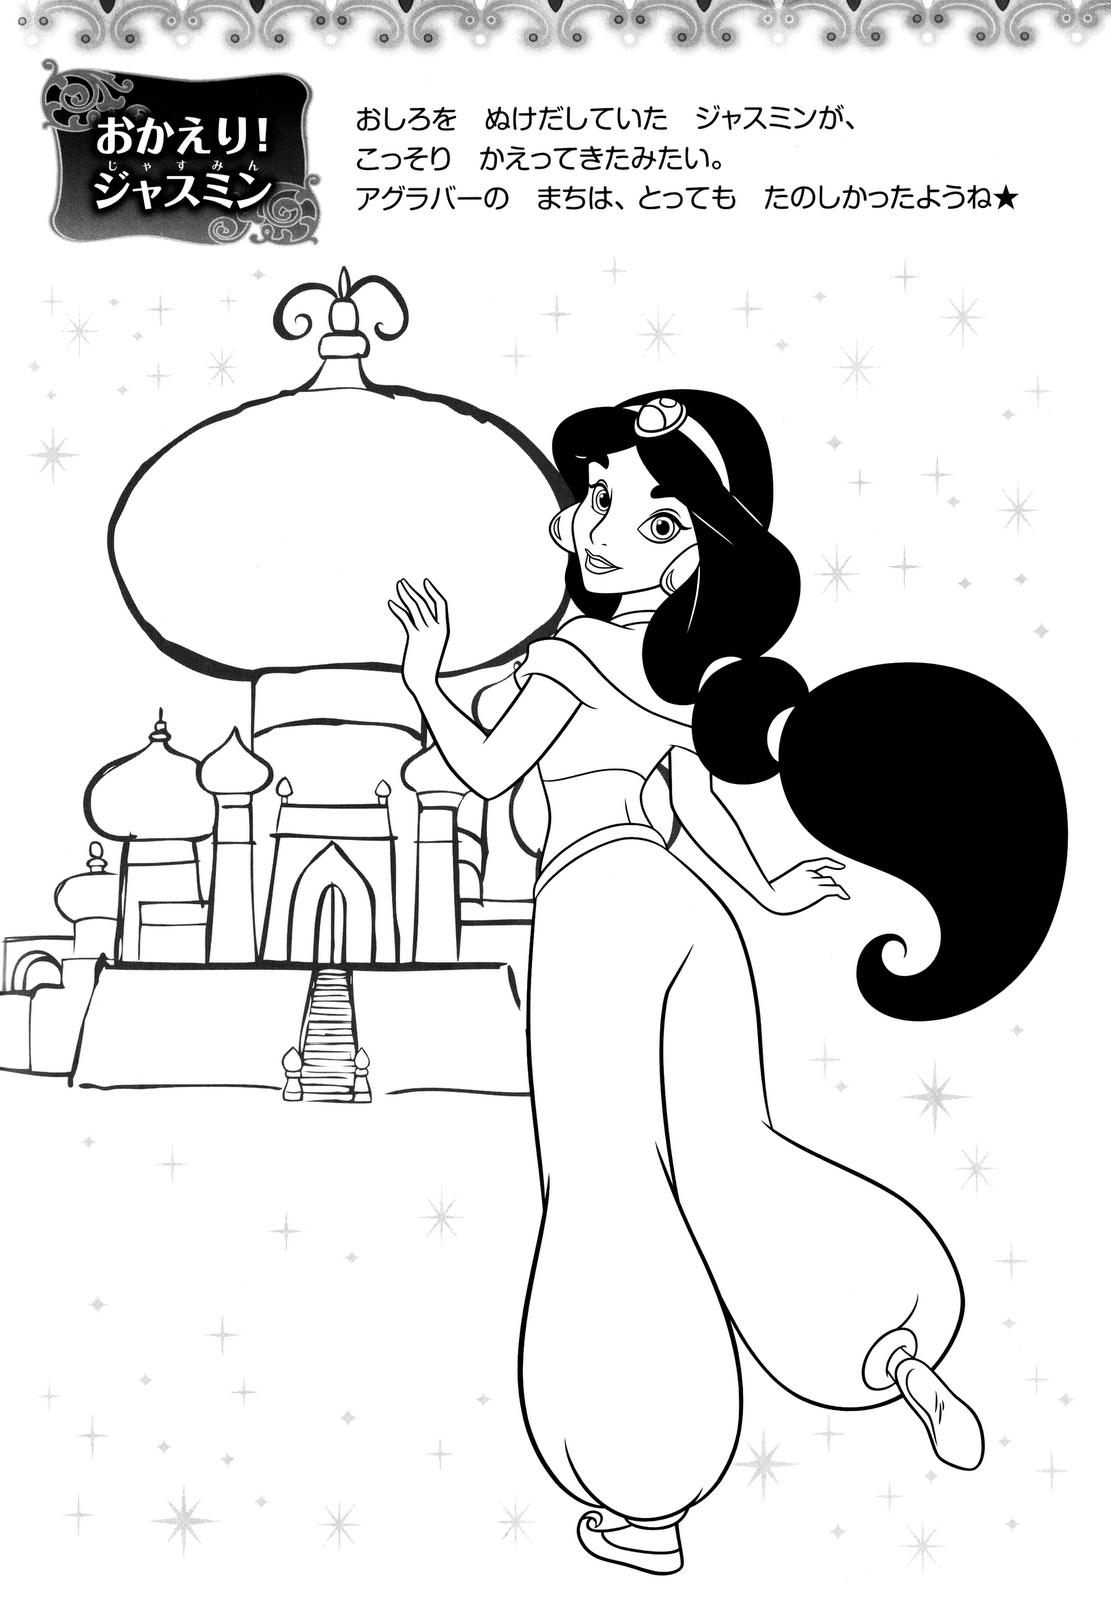 Princesas disney - Yasmine de aladin ...